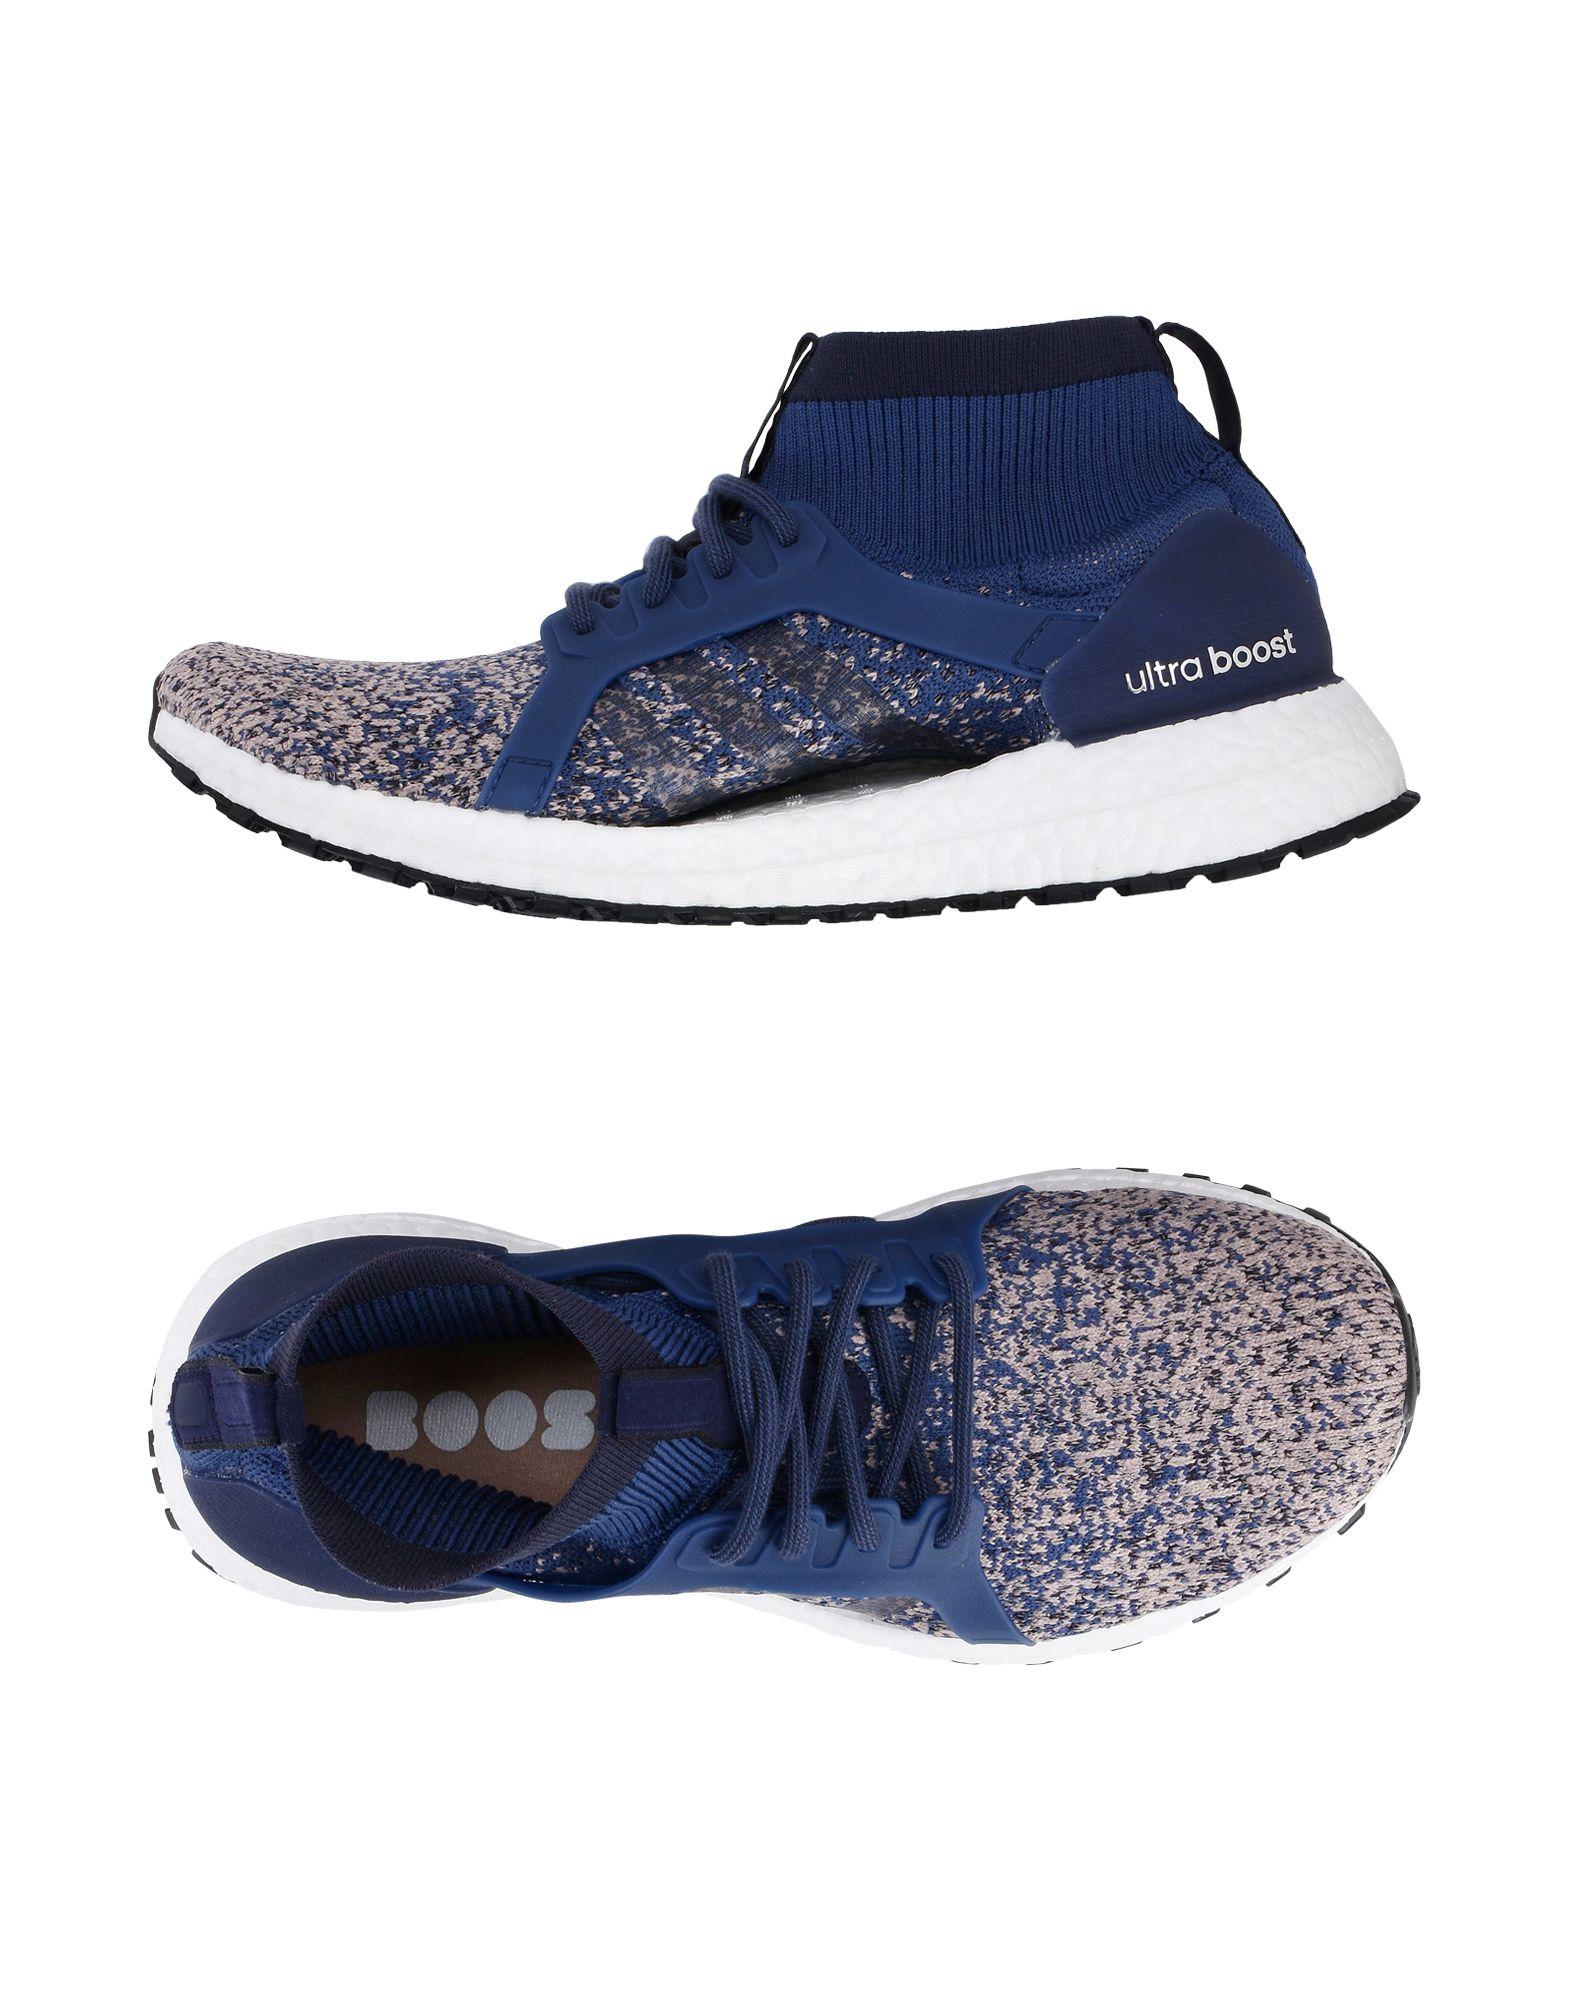 Sneakers Adidas Ultraboost X All Terrain - Donna - Acquista online su